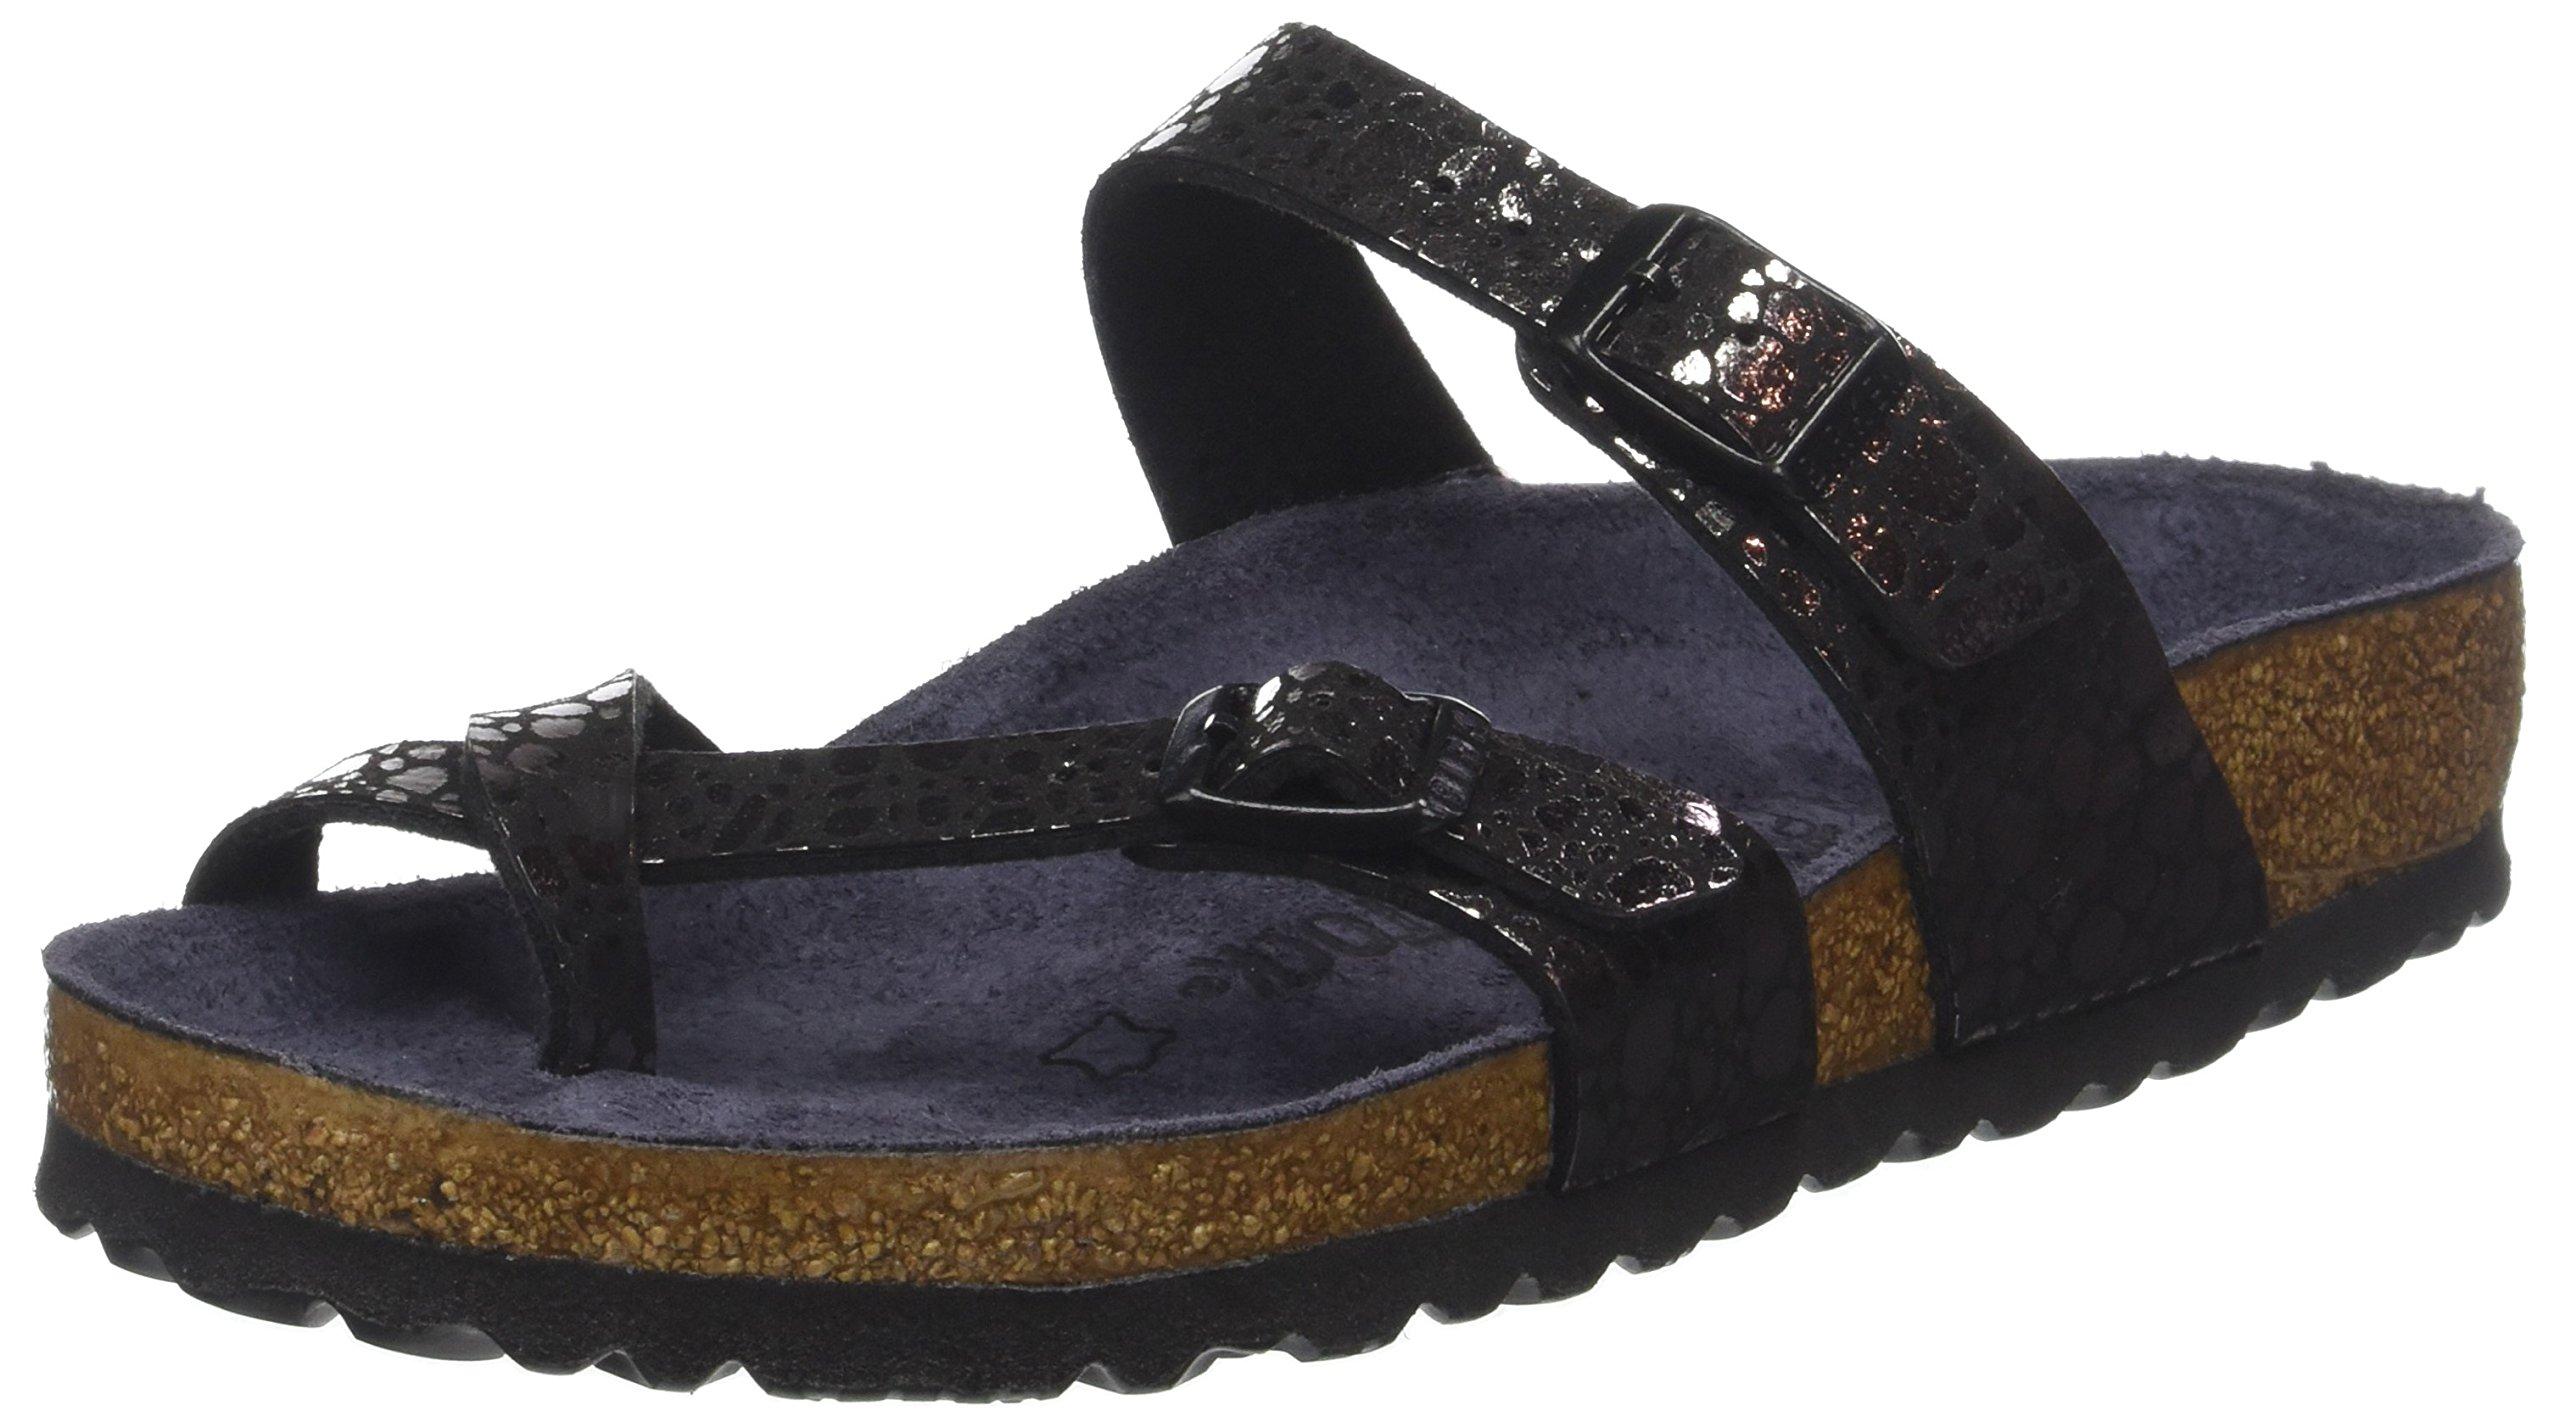 Birkenstock Mayari Birko Flor Sandals 5 B(M) US Women Metalic Stones Black